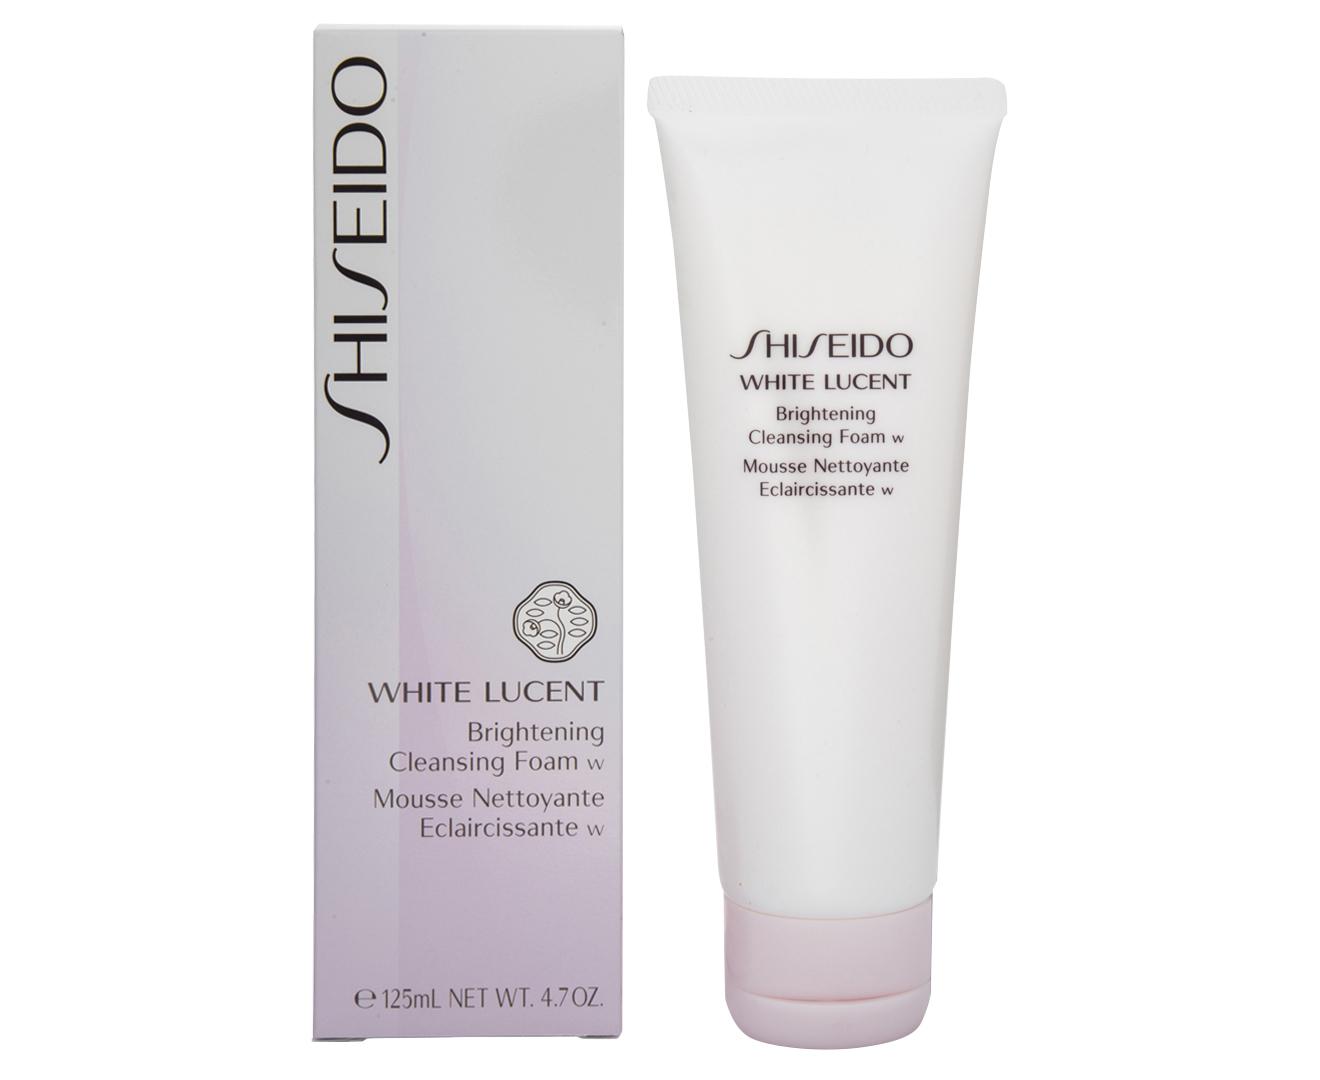 Shiseido White Lucent Brightening Cleansing Foam 125mL ...